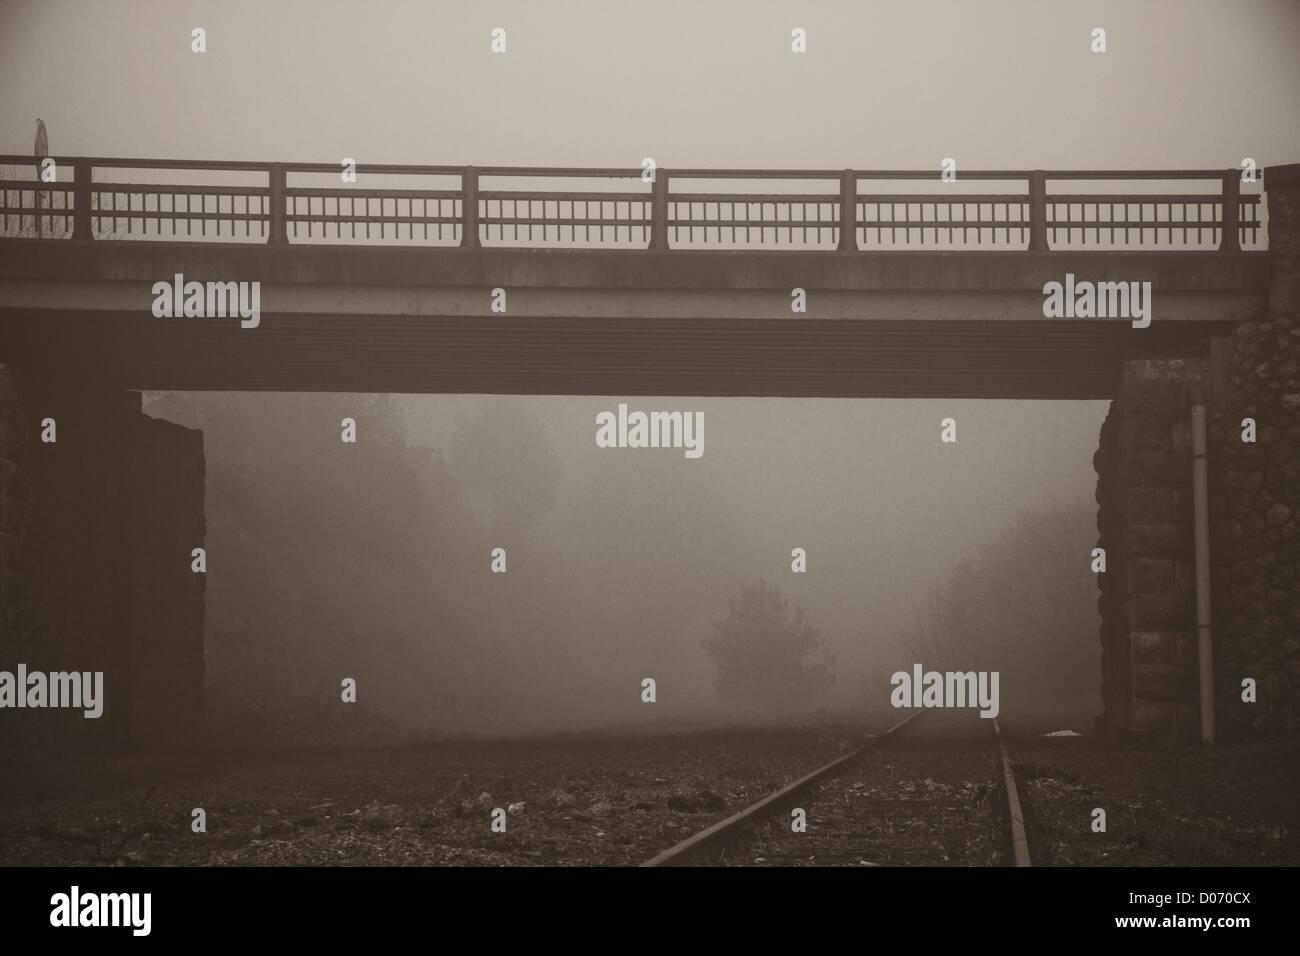 Mist over railway track and bridge. - Stock Image